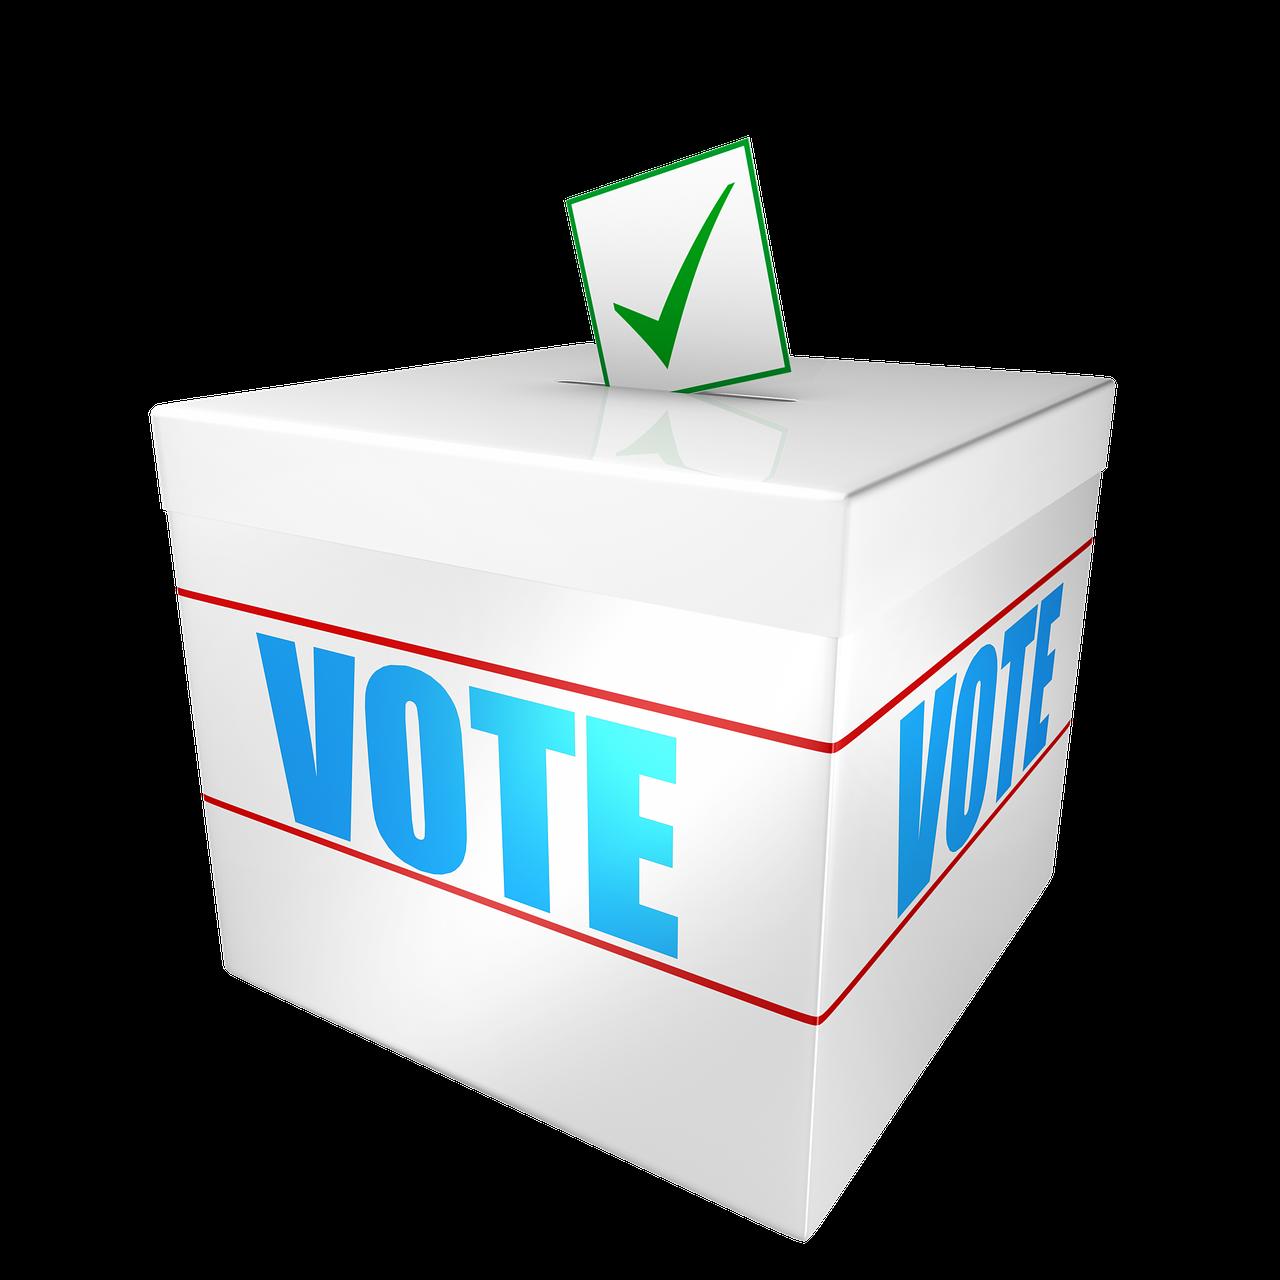 ballot-box-1359527_1280